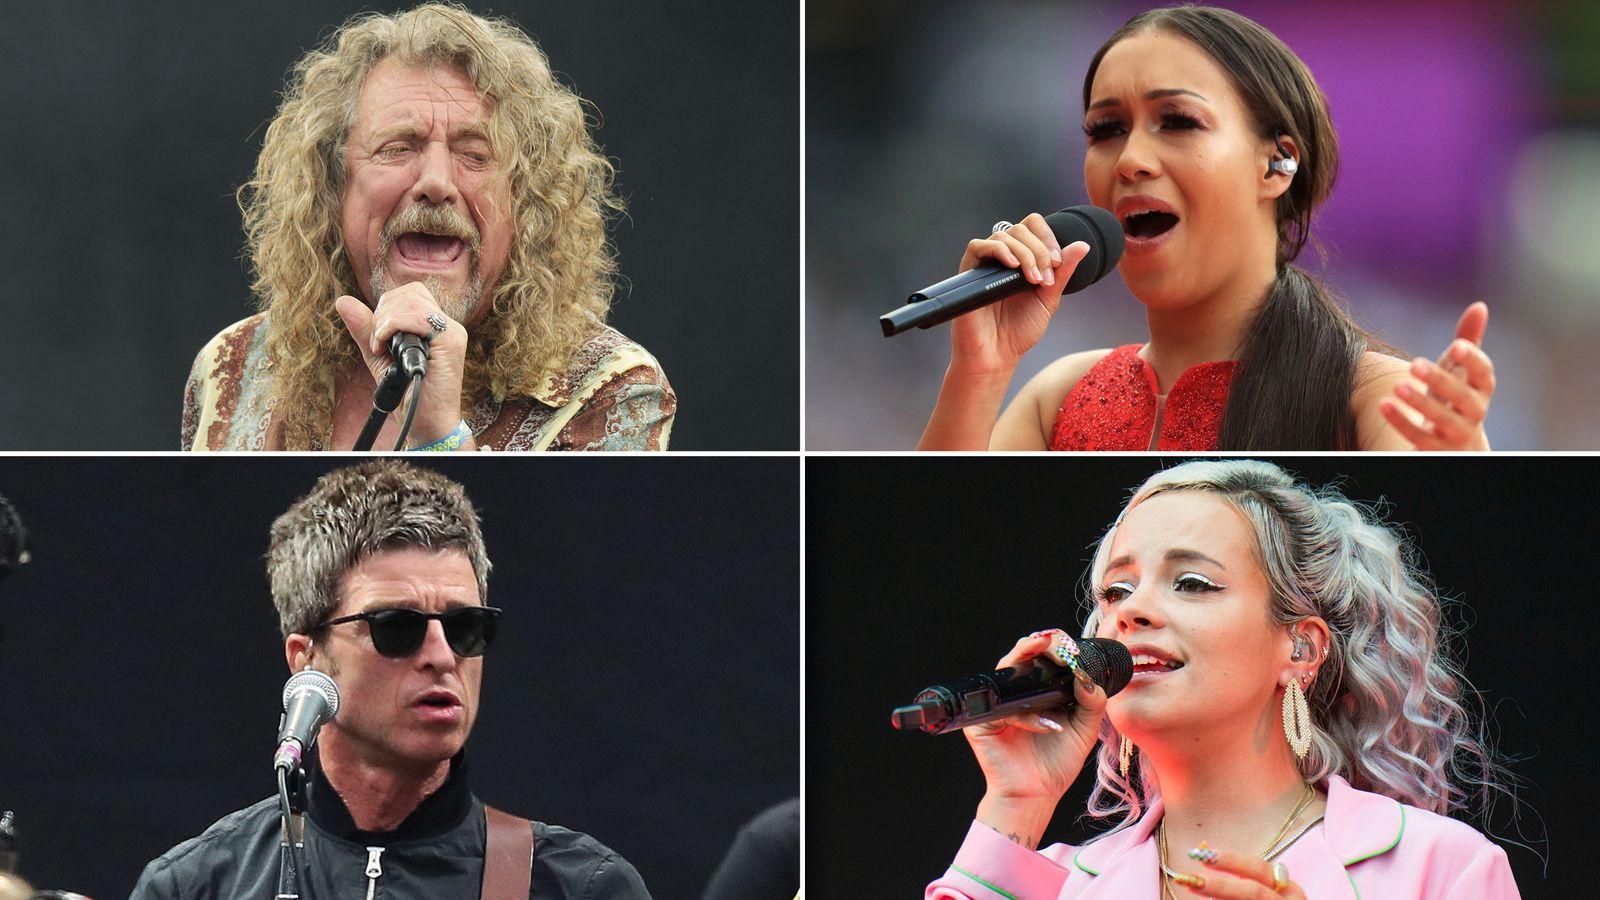 Noel Gallagher, Lily Allen, Rebecca Ferguson and dozens more music stars calling on Boris Johnson to change streaming law